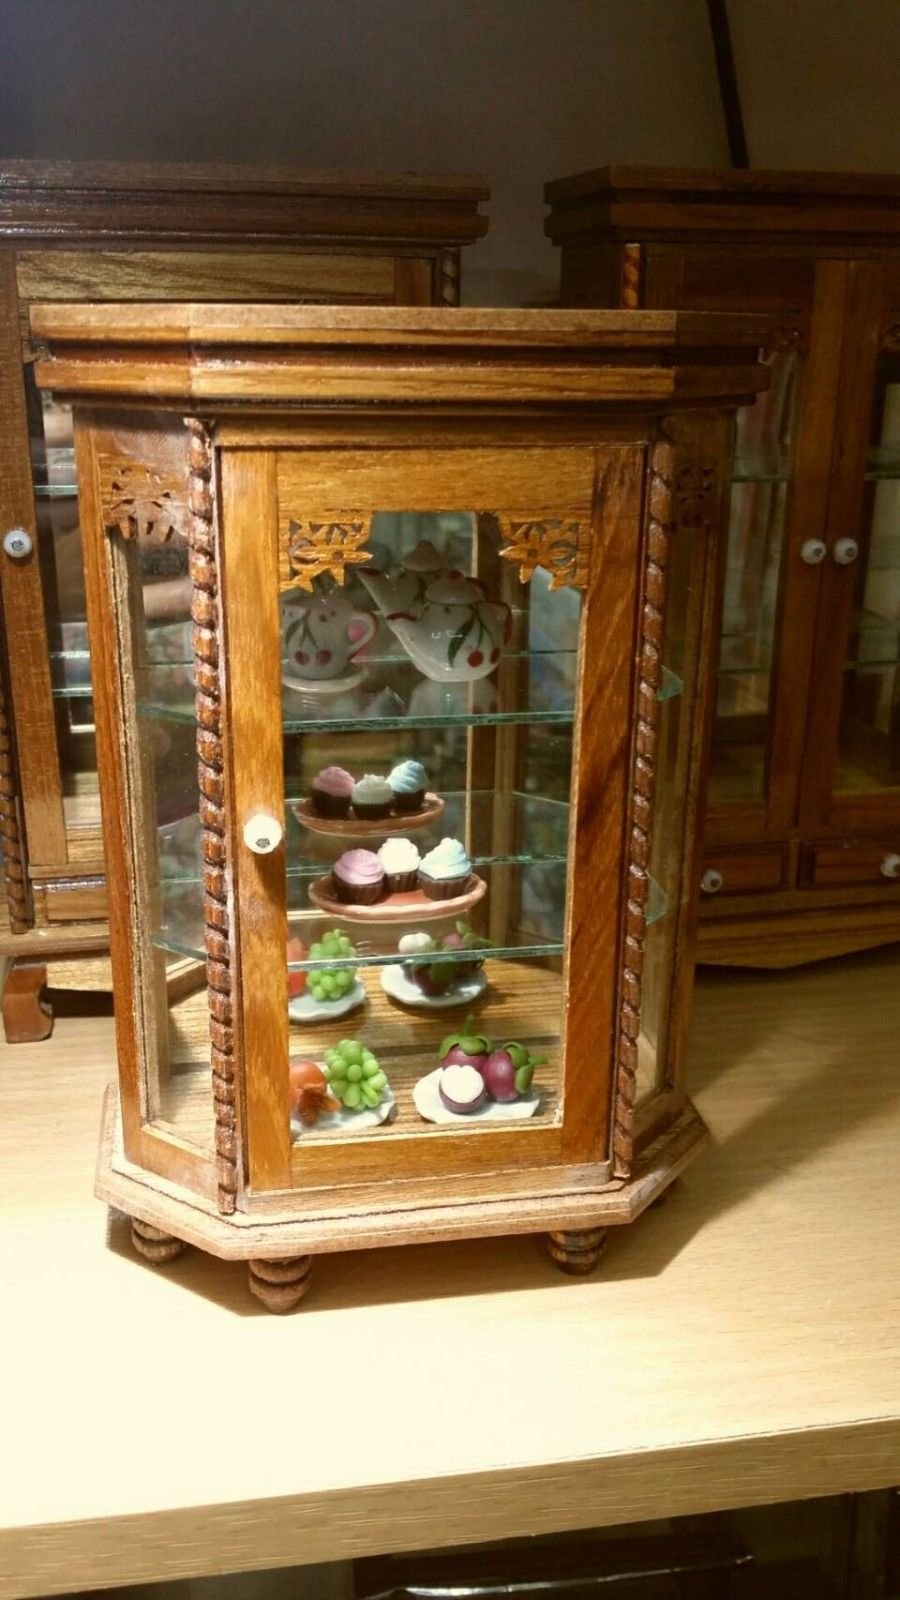 Mini Vintage Cupboard Teak Wood Cabinet Craft Handmade Carved Thai Furniture with 5 Food Models